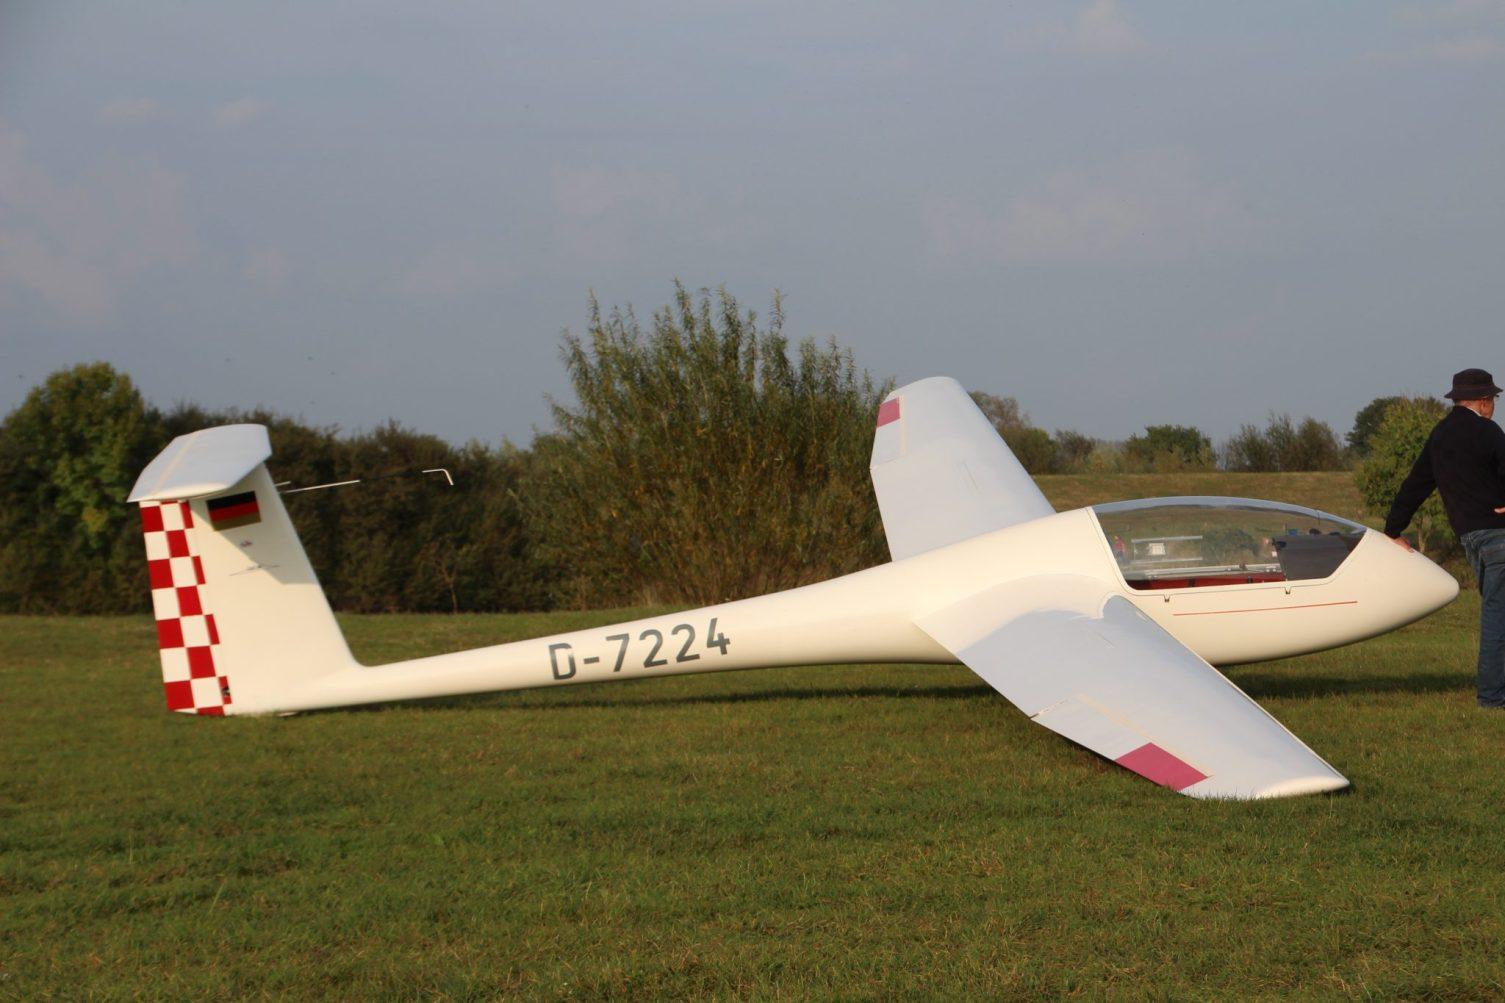 Grob Astir CS (D-7224 (24))